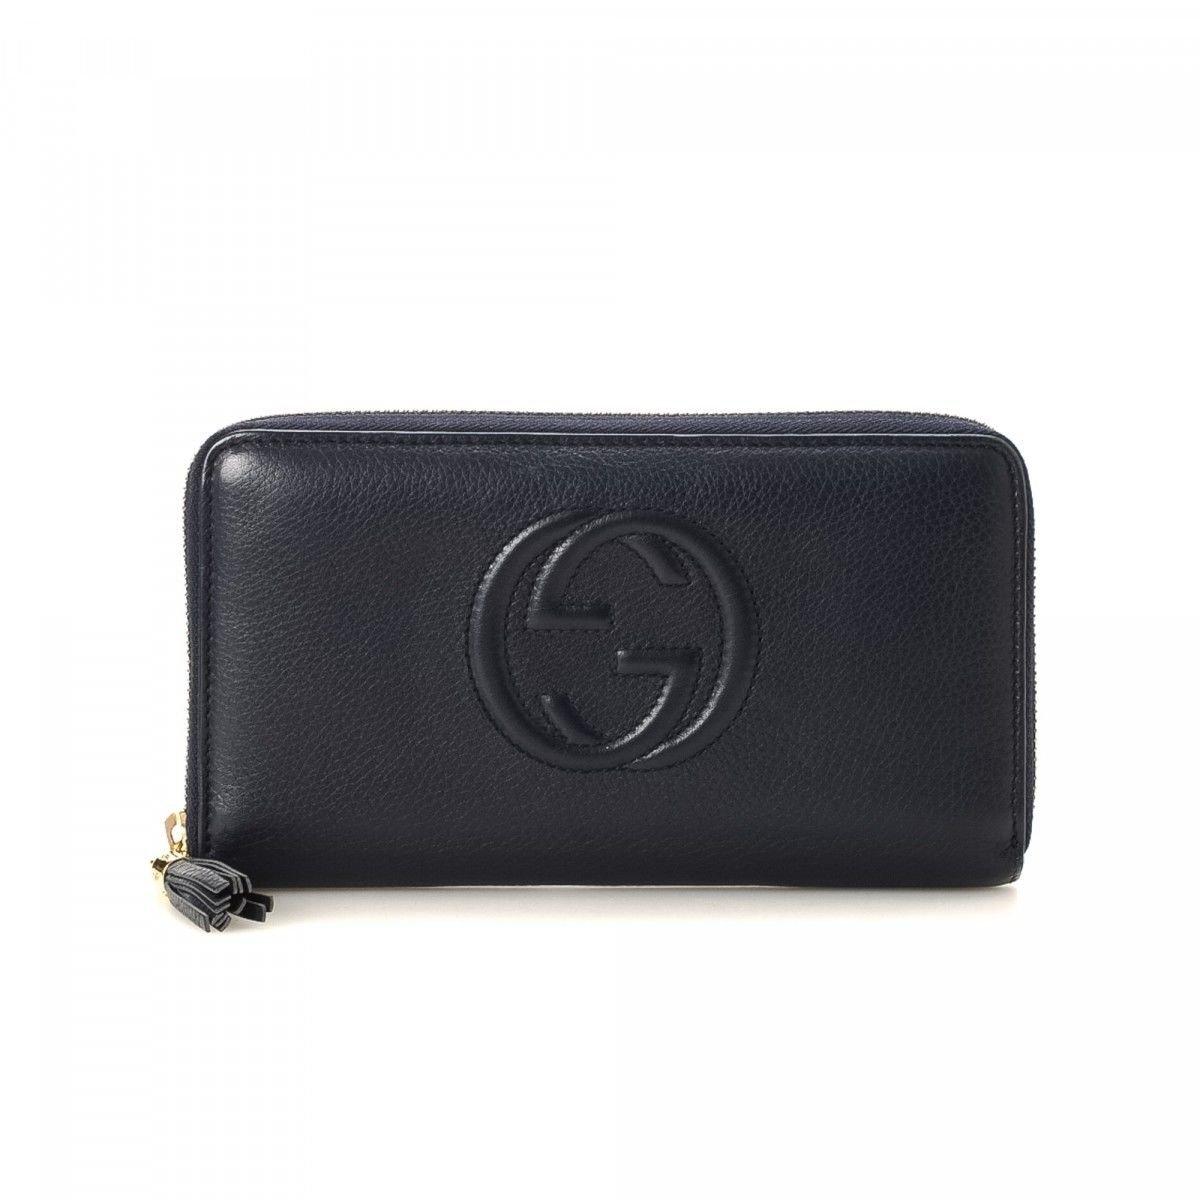 13109a34d7c3 Amazon.com: Gucci Soho Mini Black Round Light Gold Disco Zip Italy Leather  Handbag Bag New: Shoes